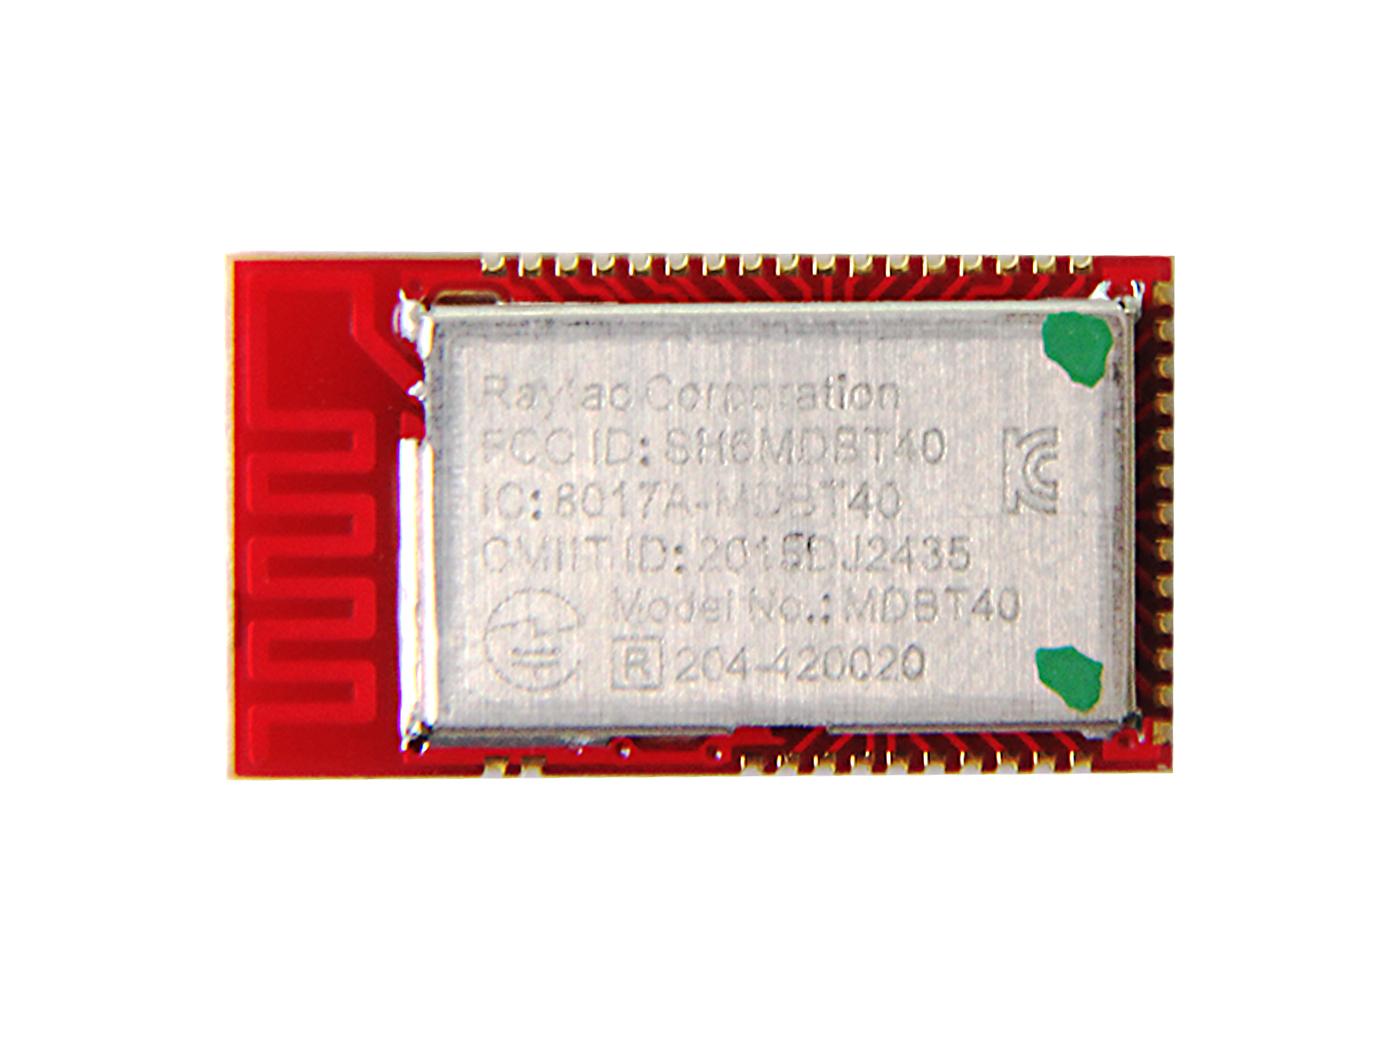 MDBT40-ANT-P256V3 nRF51422 based BLE Module